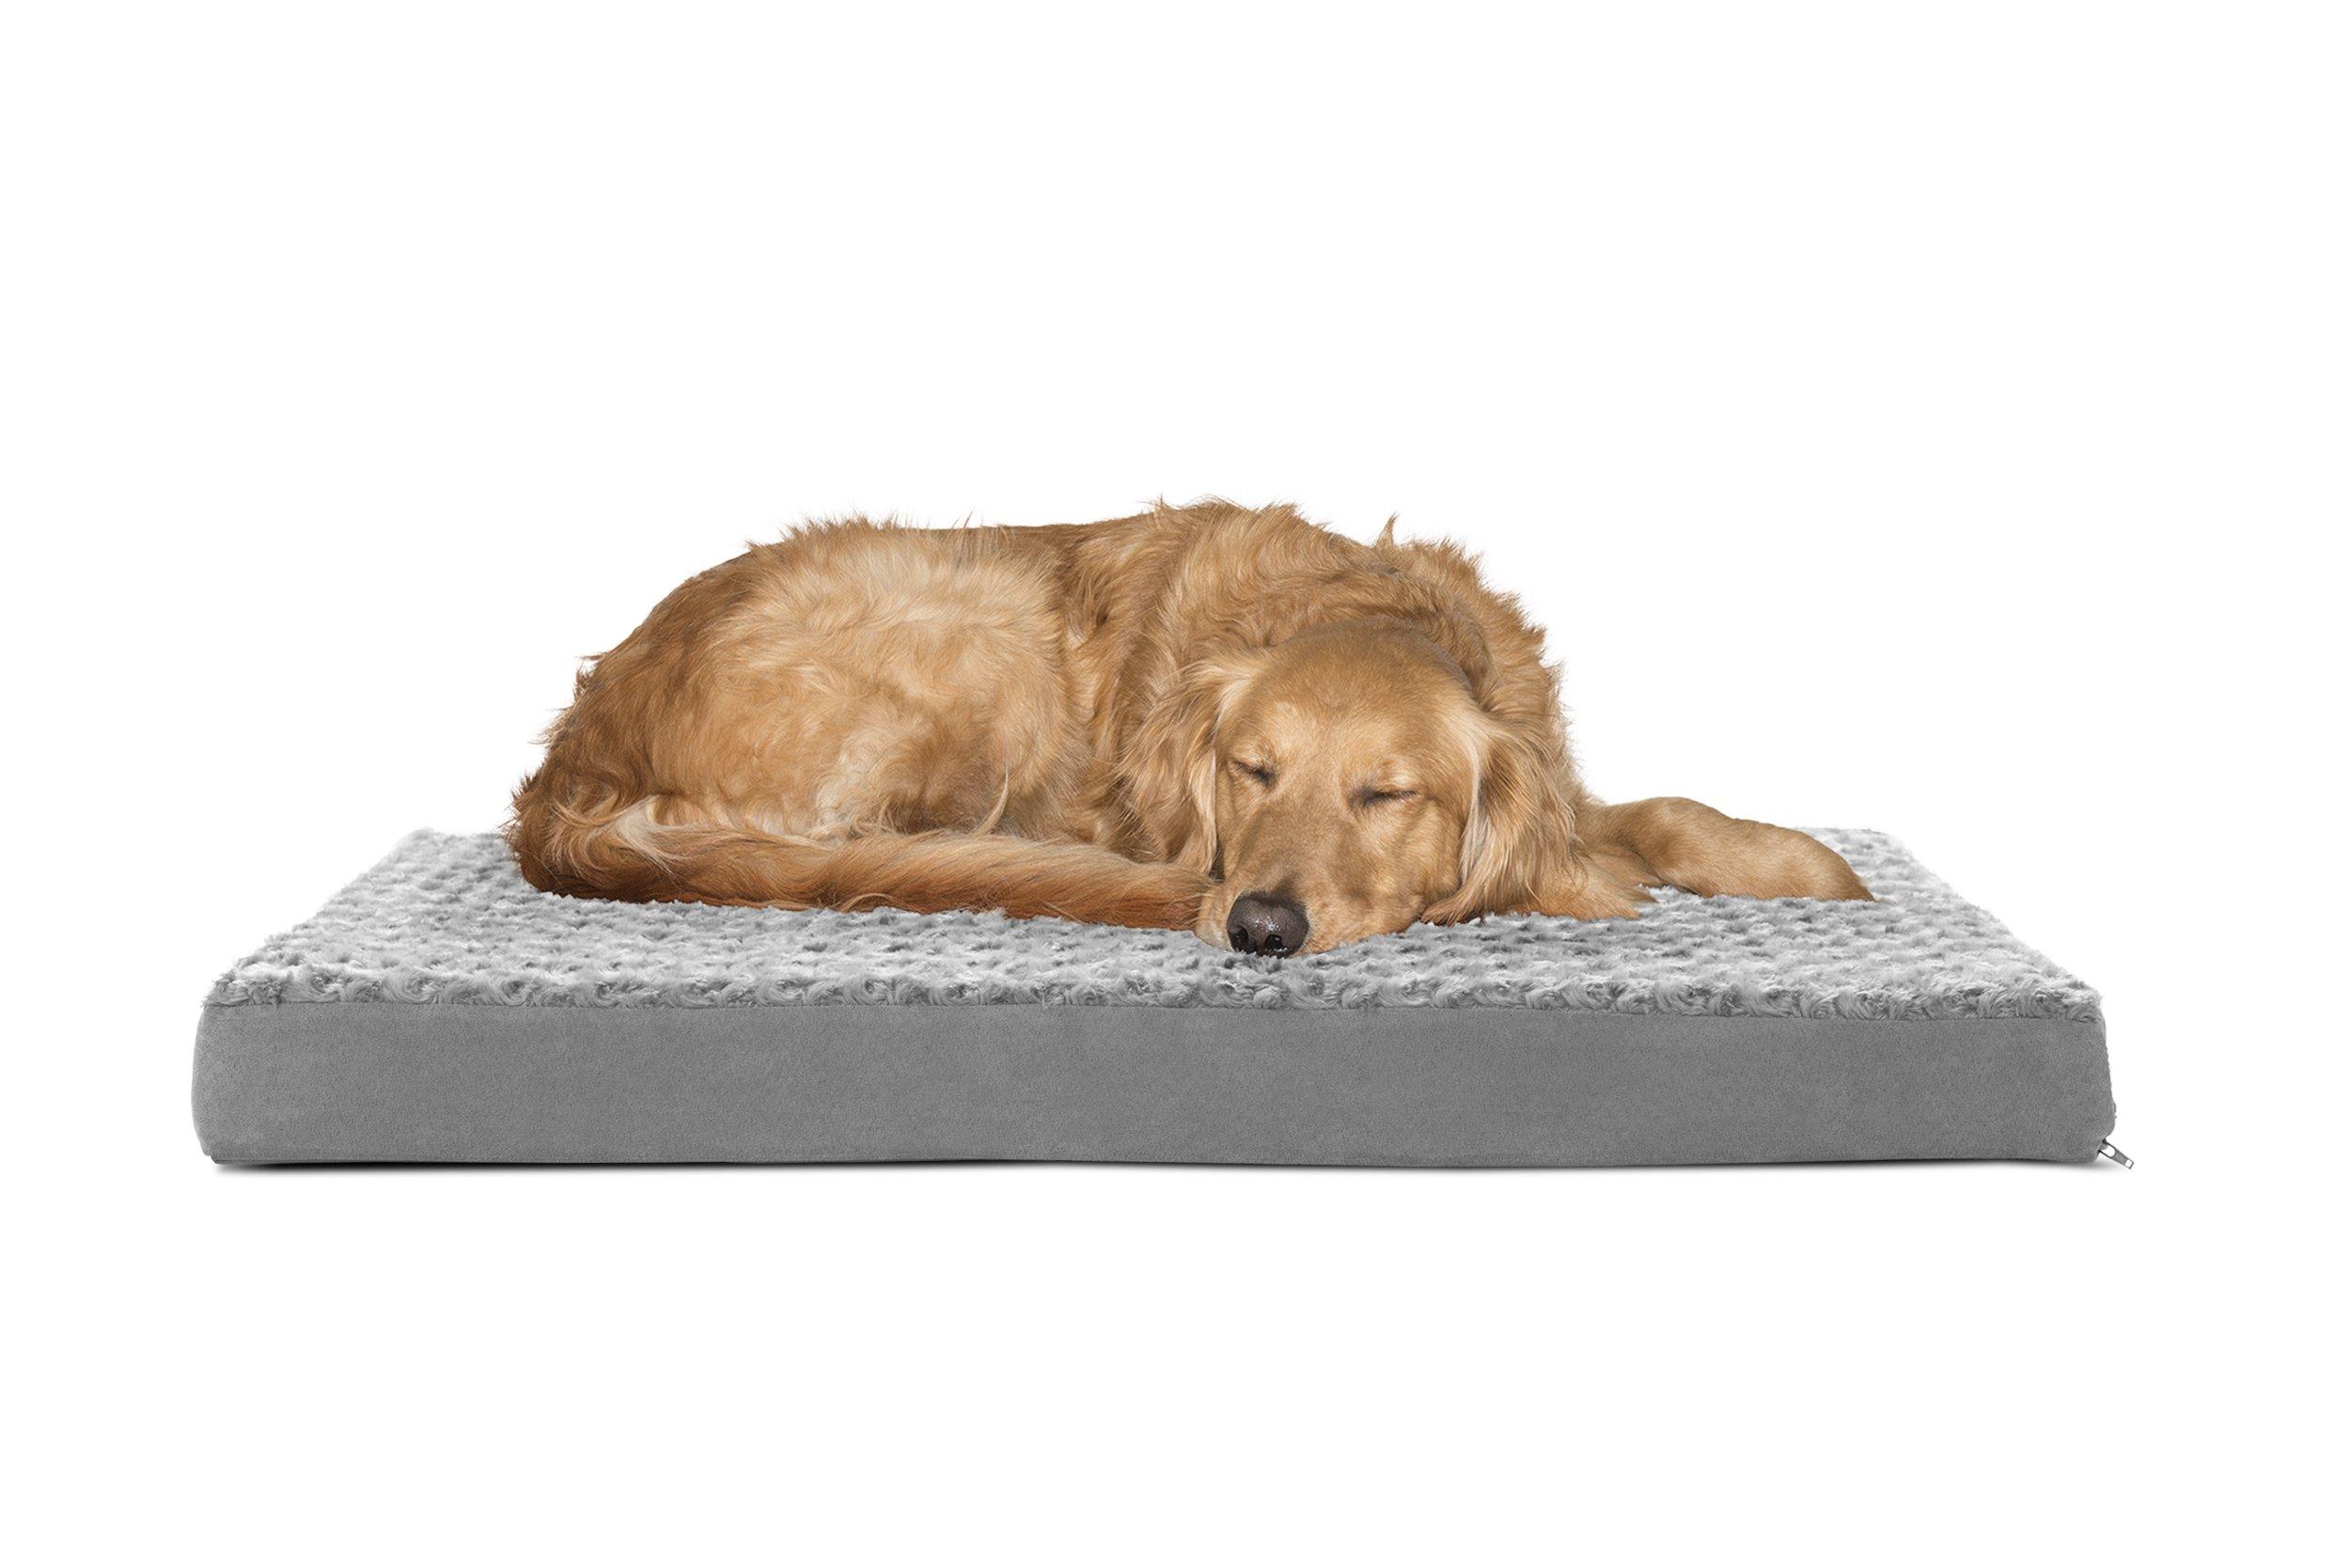 Furhaven Pet Orthopedic Pet Mattress, Large, Gray